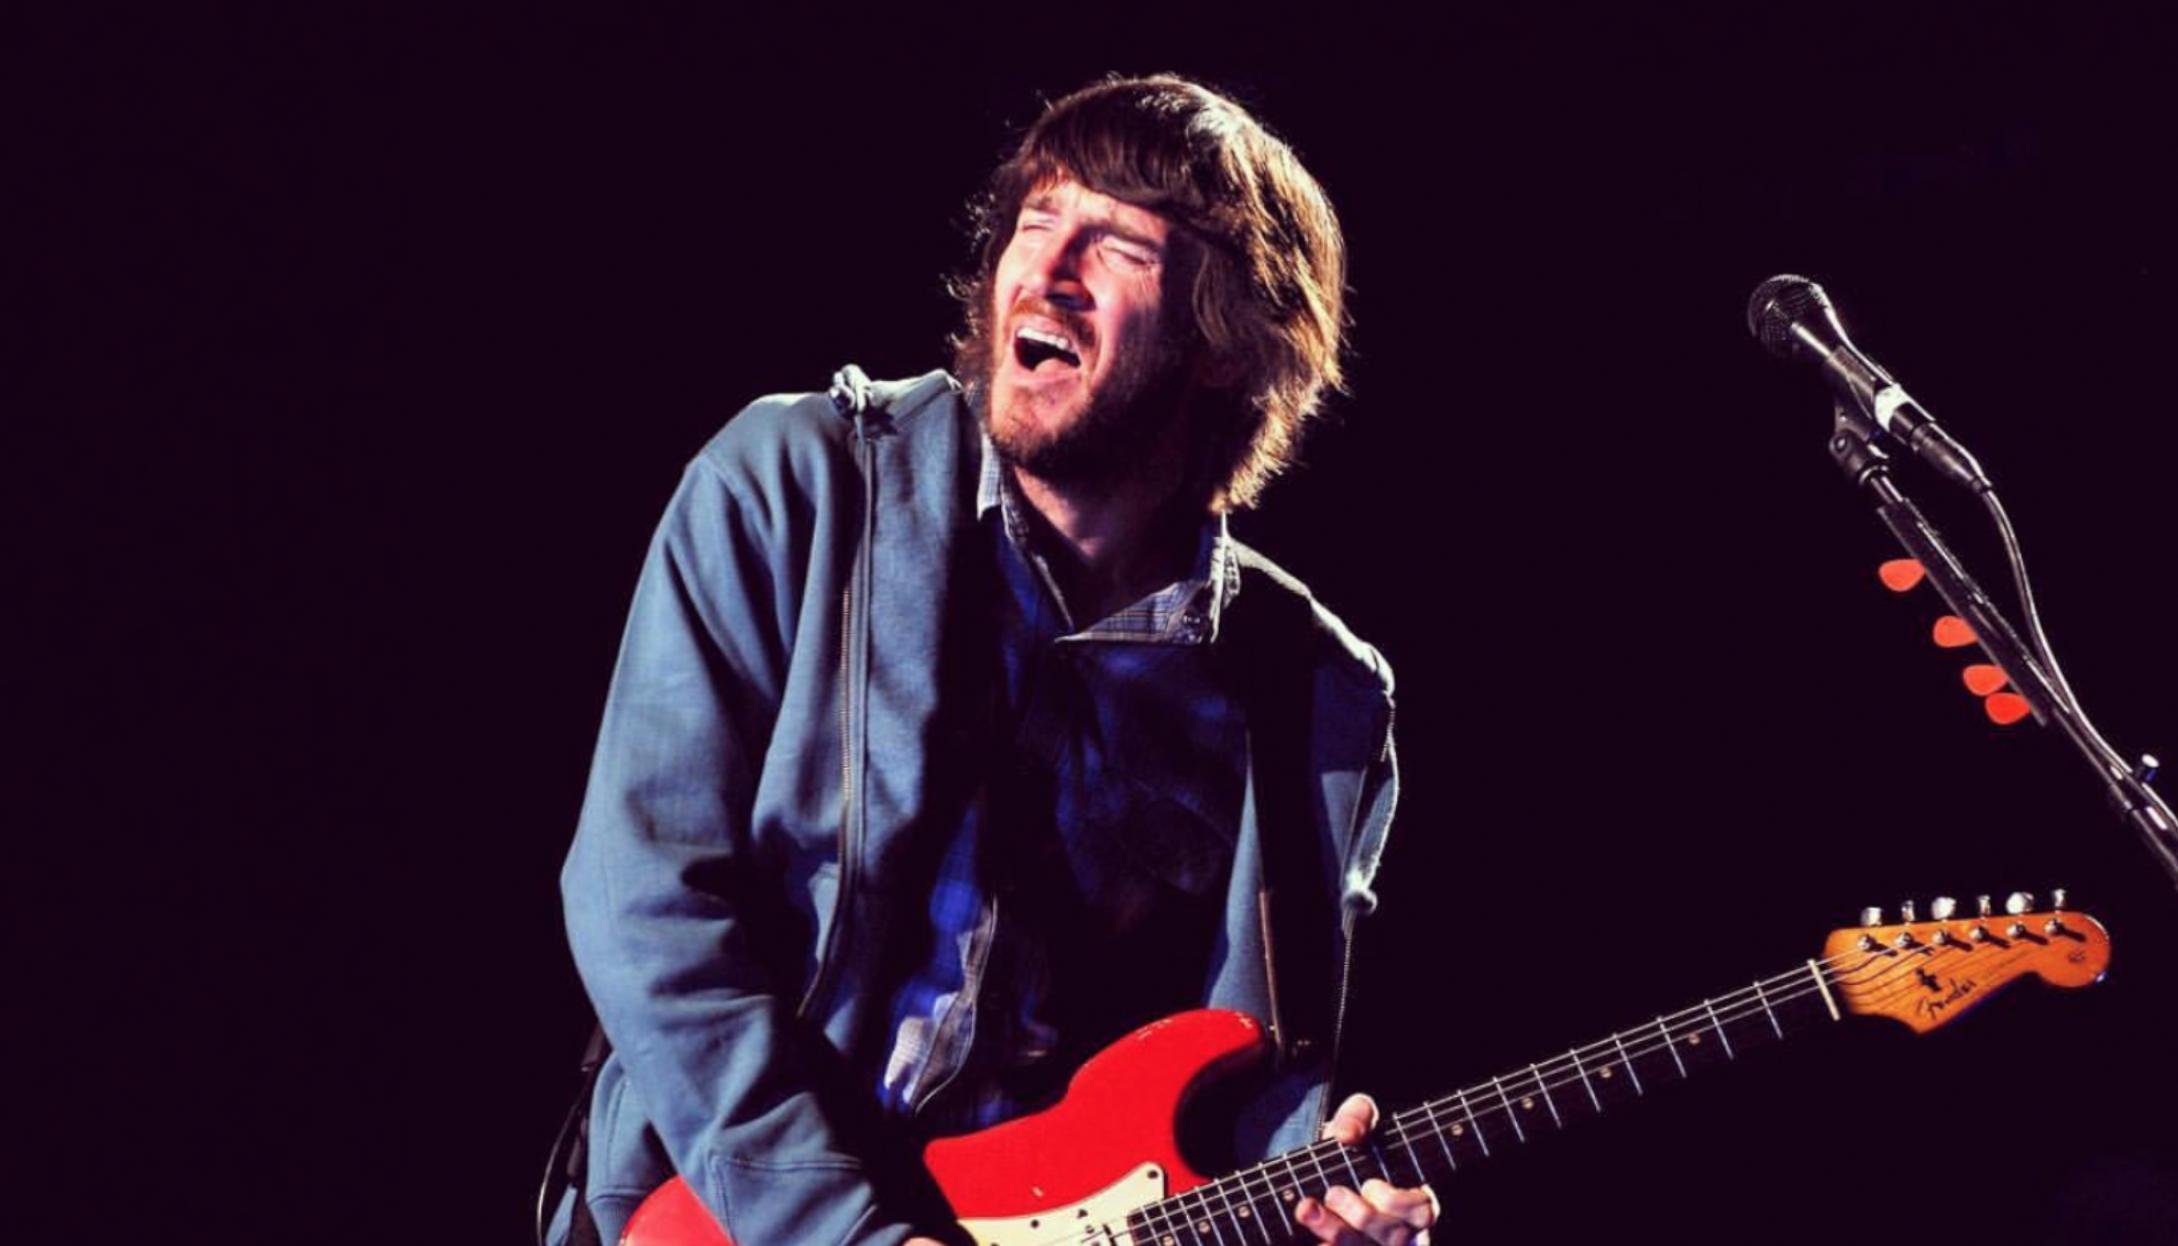 John frusciante tattoo arm